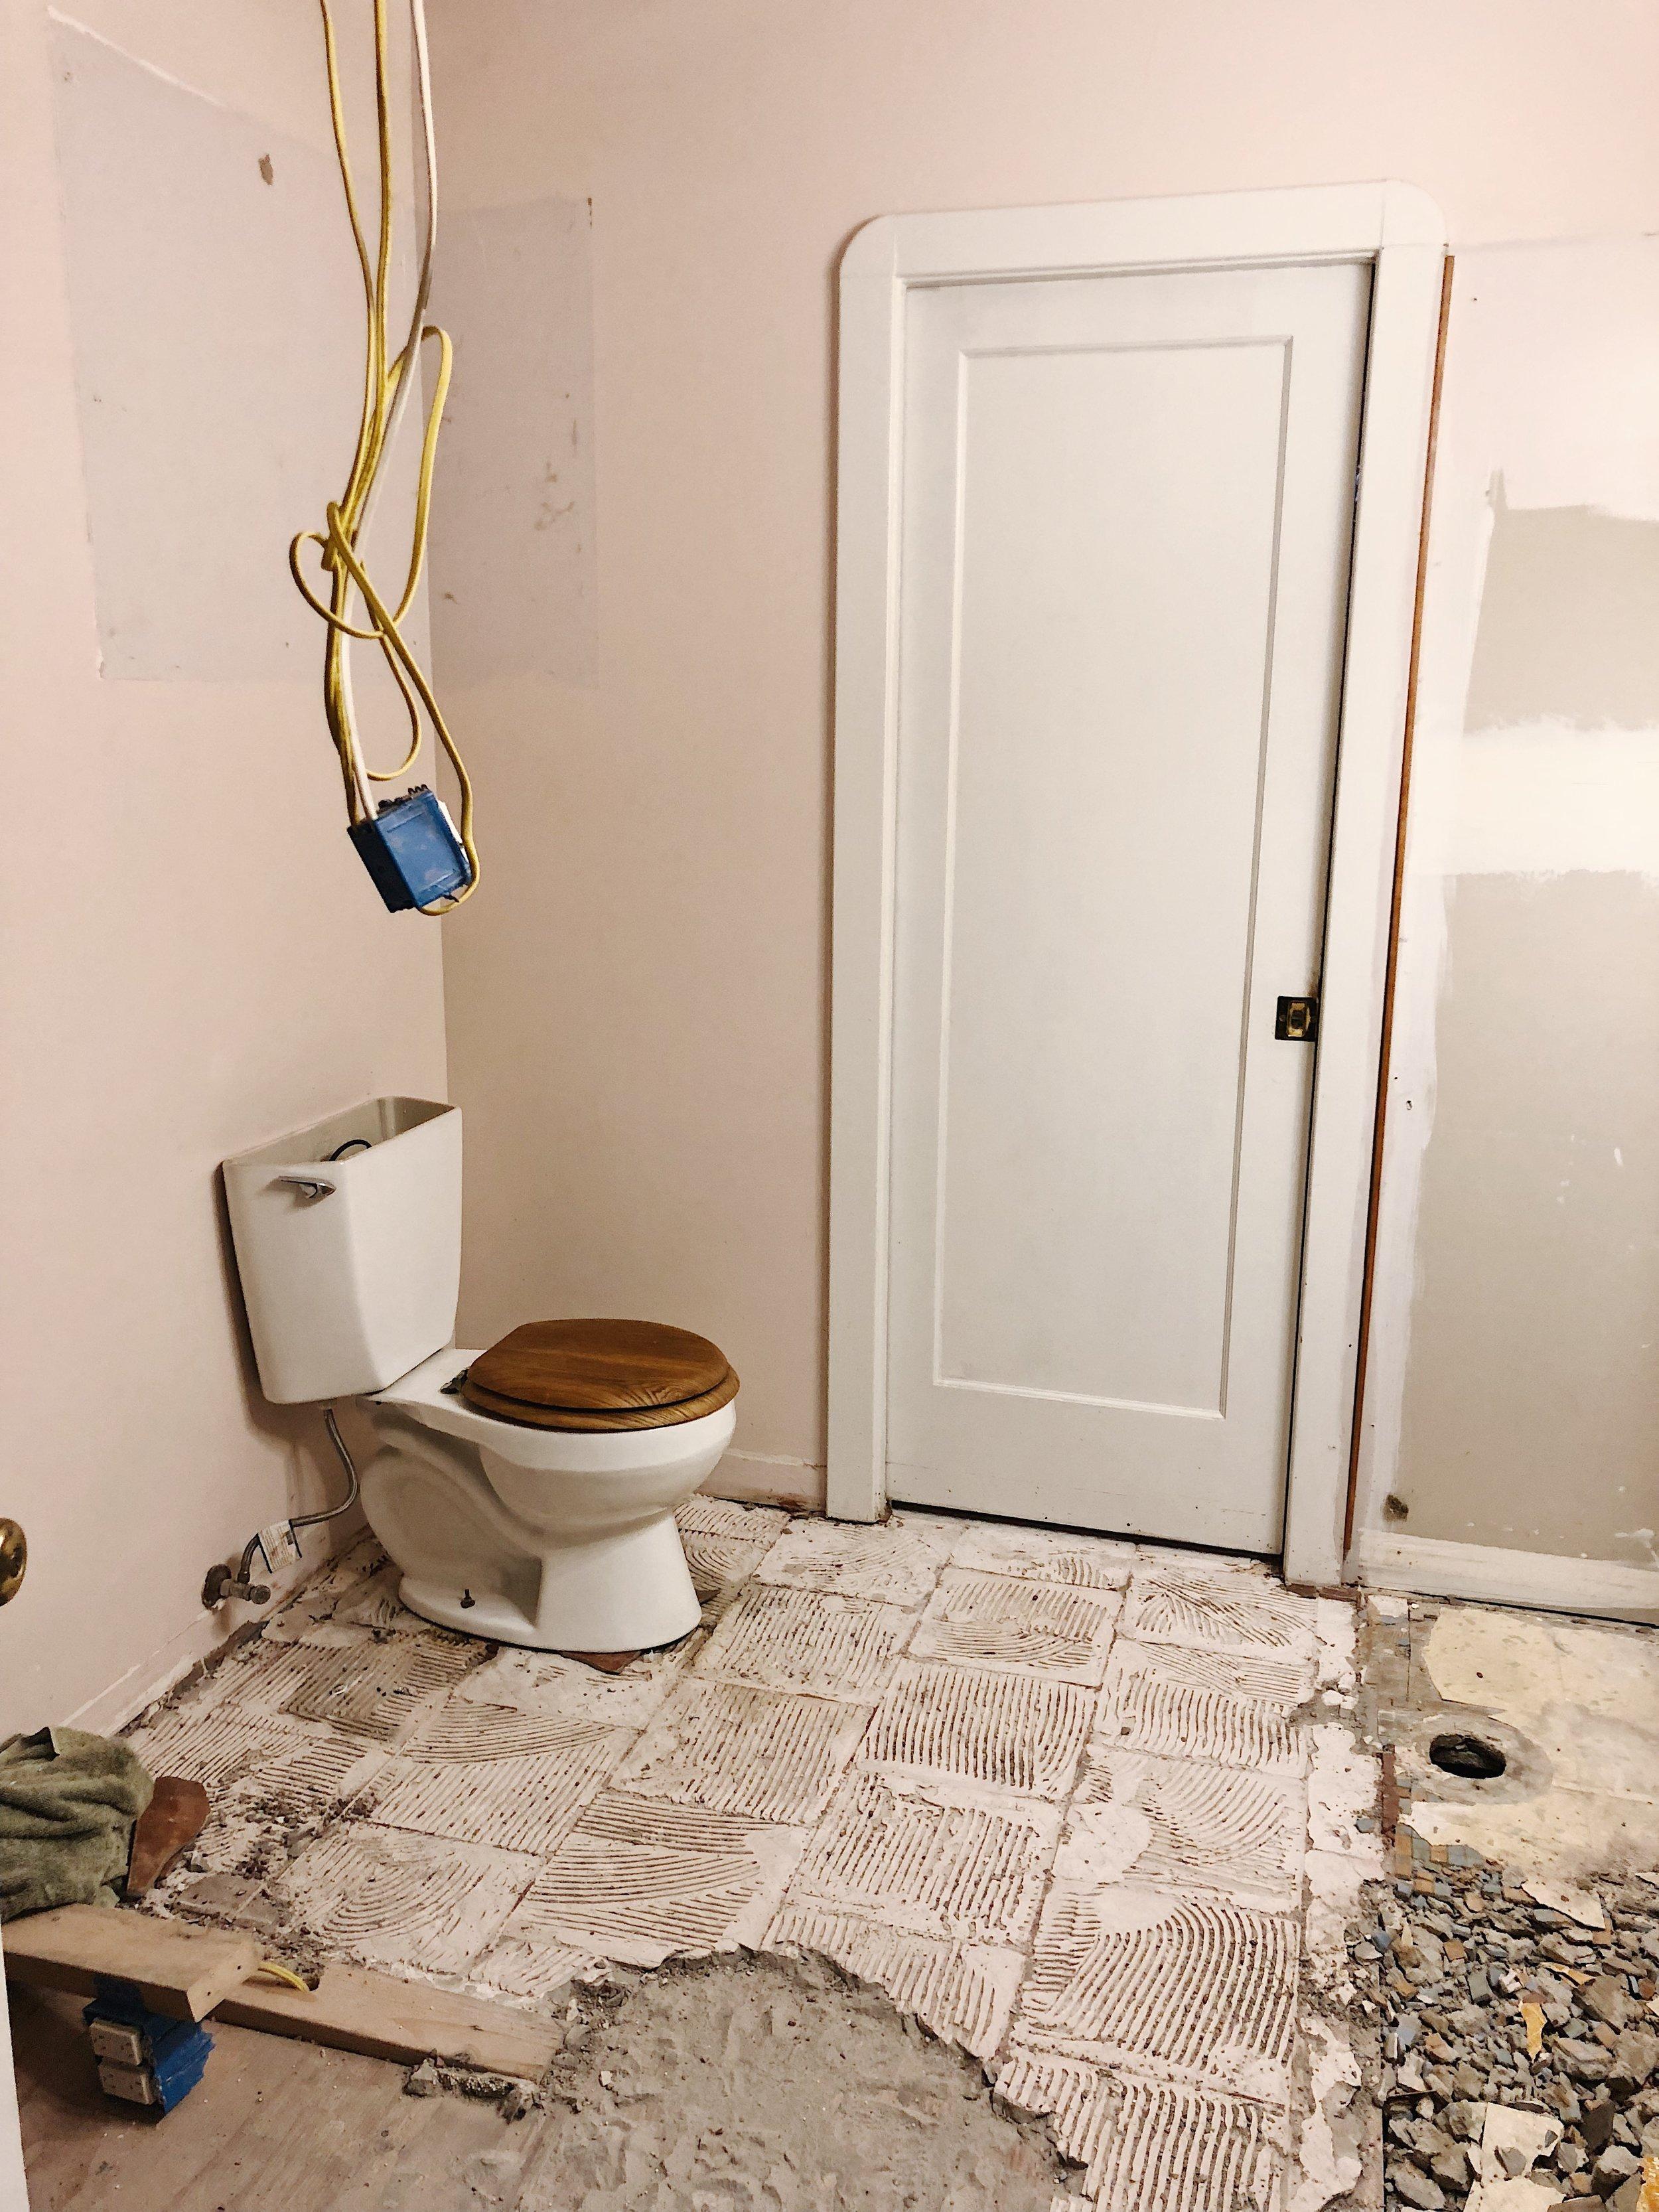 Lonely Toilet.JPG